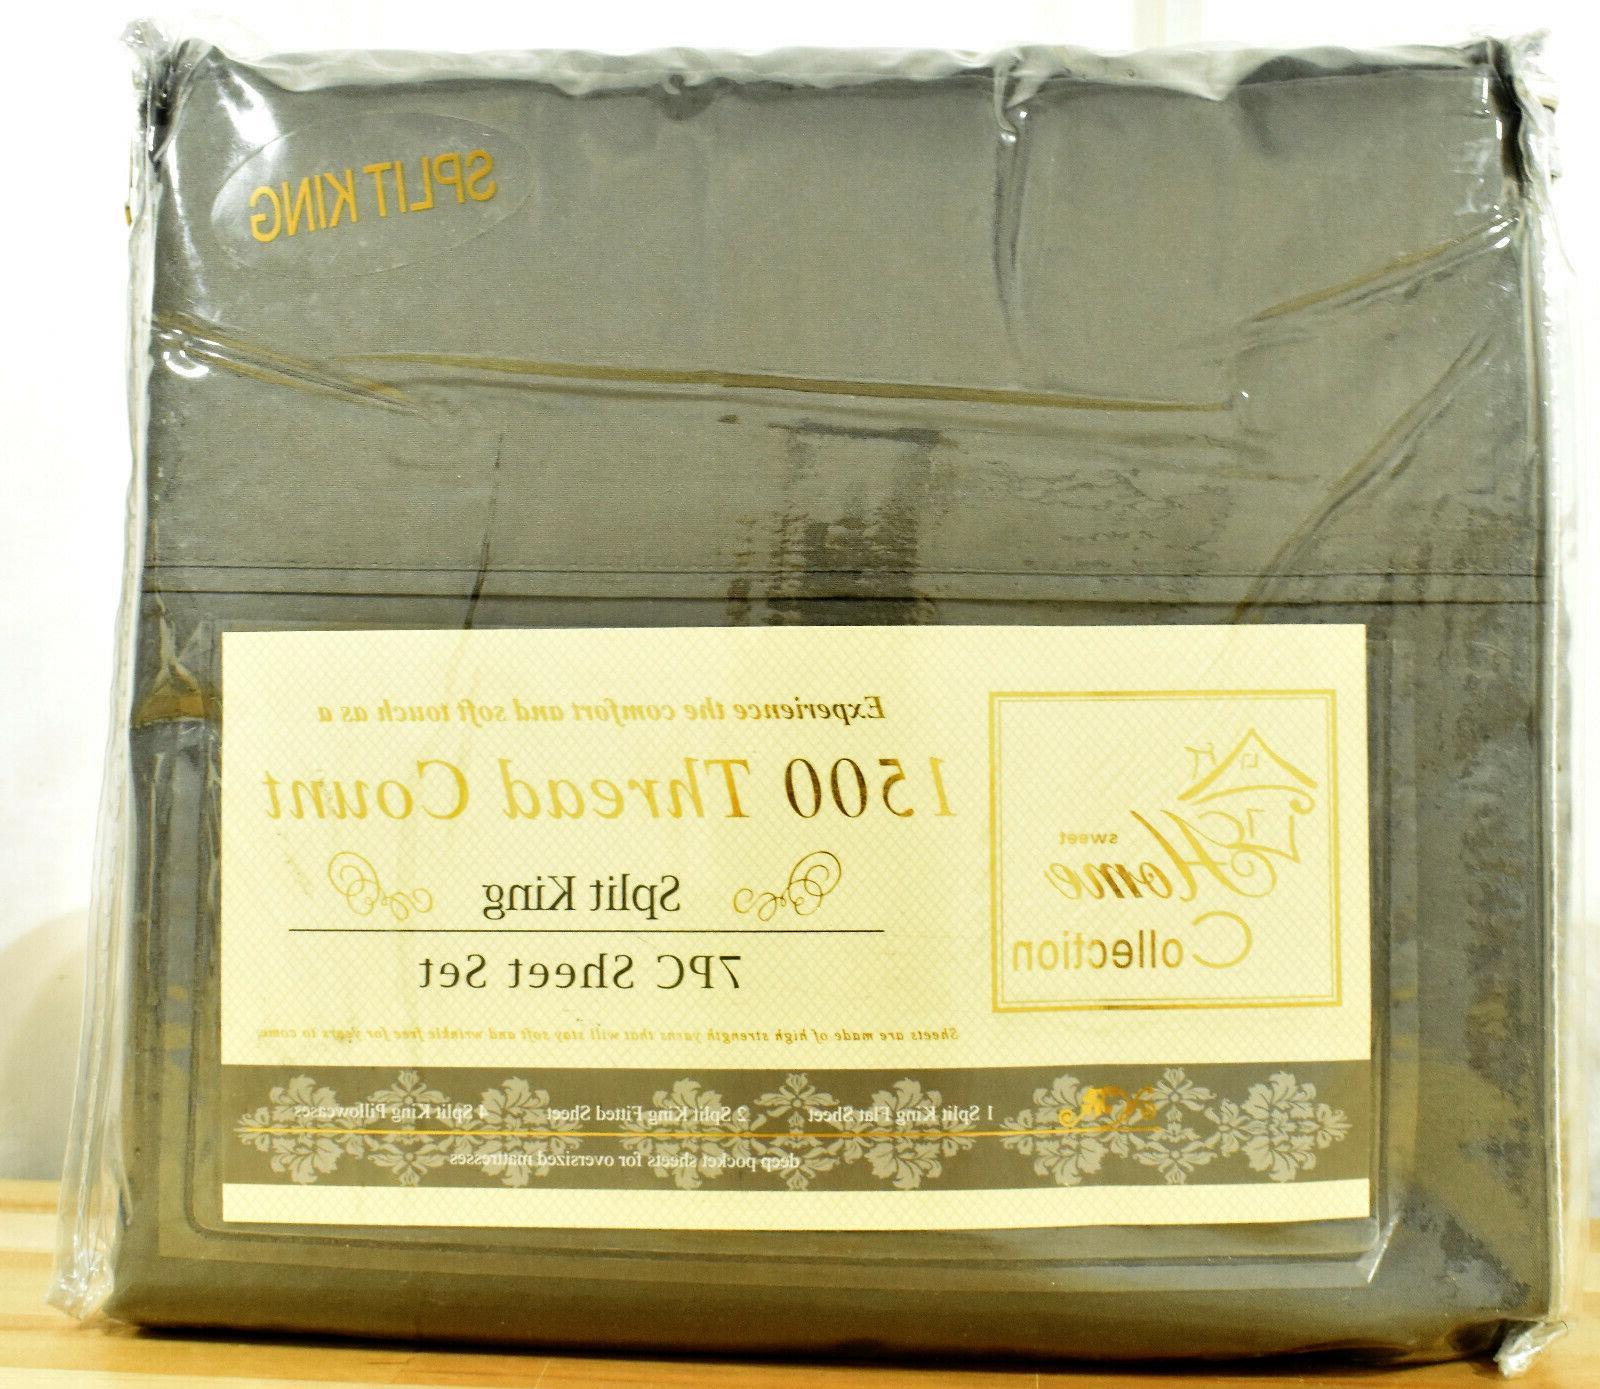 1500 thread count split king sheet set